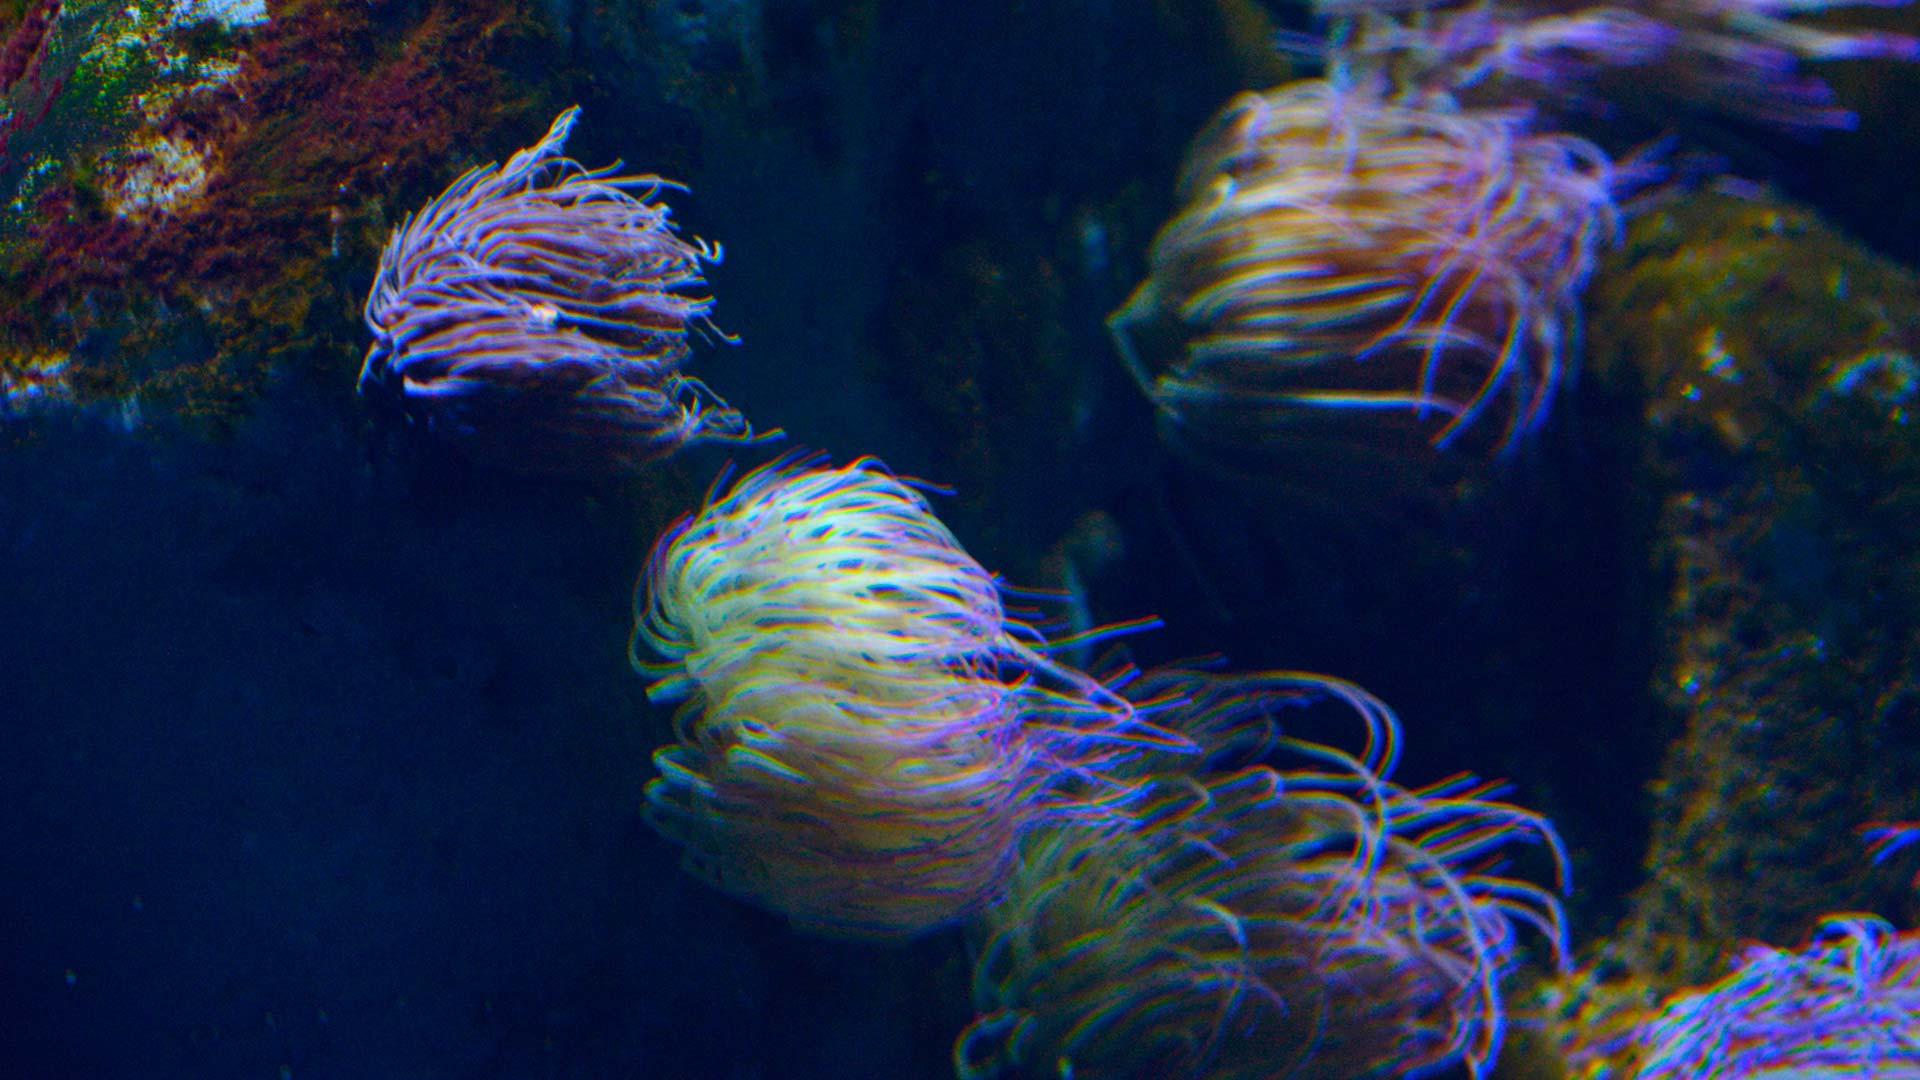 Snakelocks sea anemone